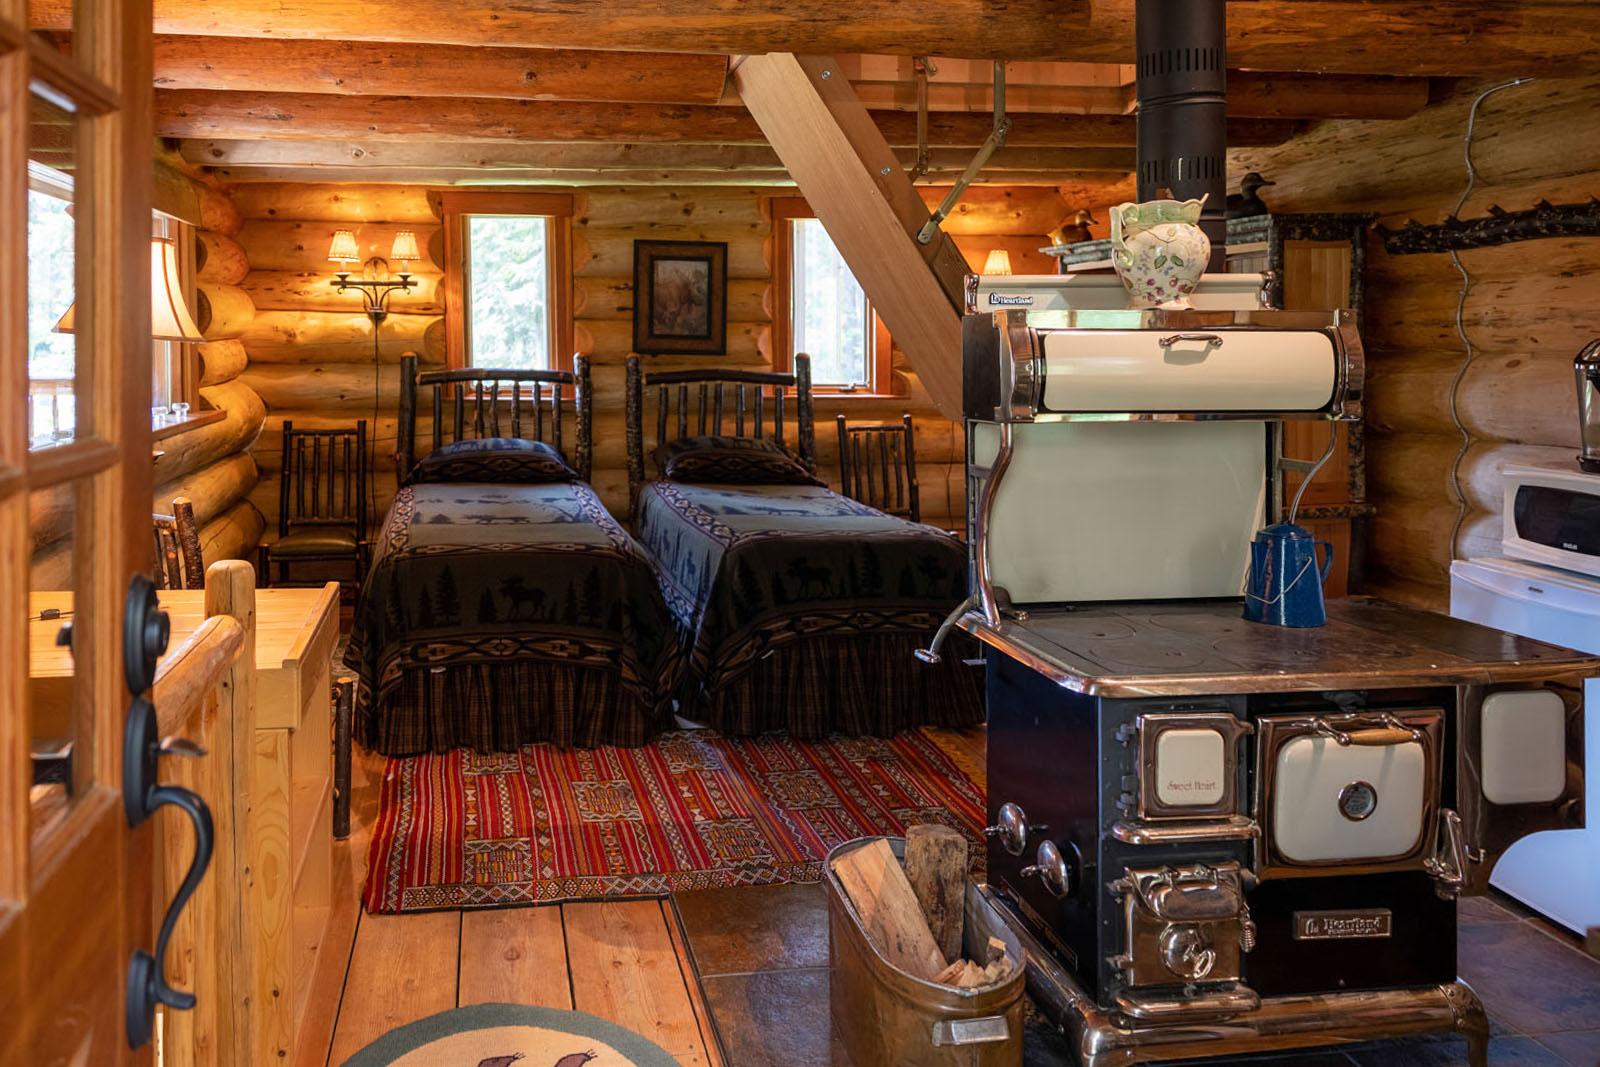 Mount robson log home 28